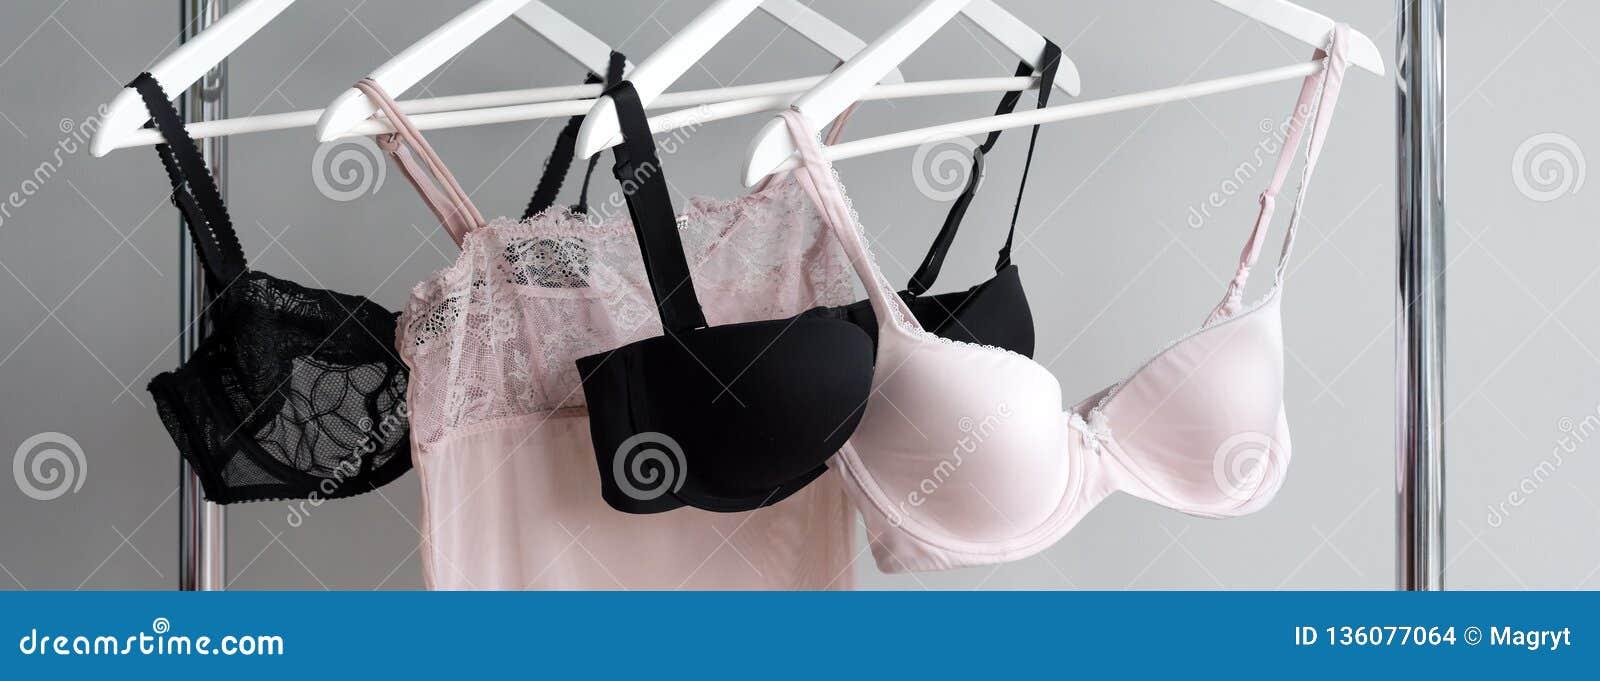 Vareity της ένωσης στηθοδέσμων σε μια κρεμάστρα Κλωστοϋφαντουργικό προϊόν, εσώρουχο Θηλυκός στηθόδεσμος lingerie στο κατάστημα εσ